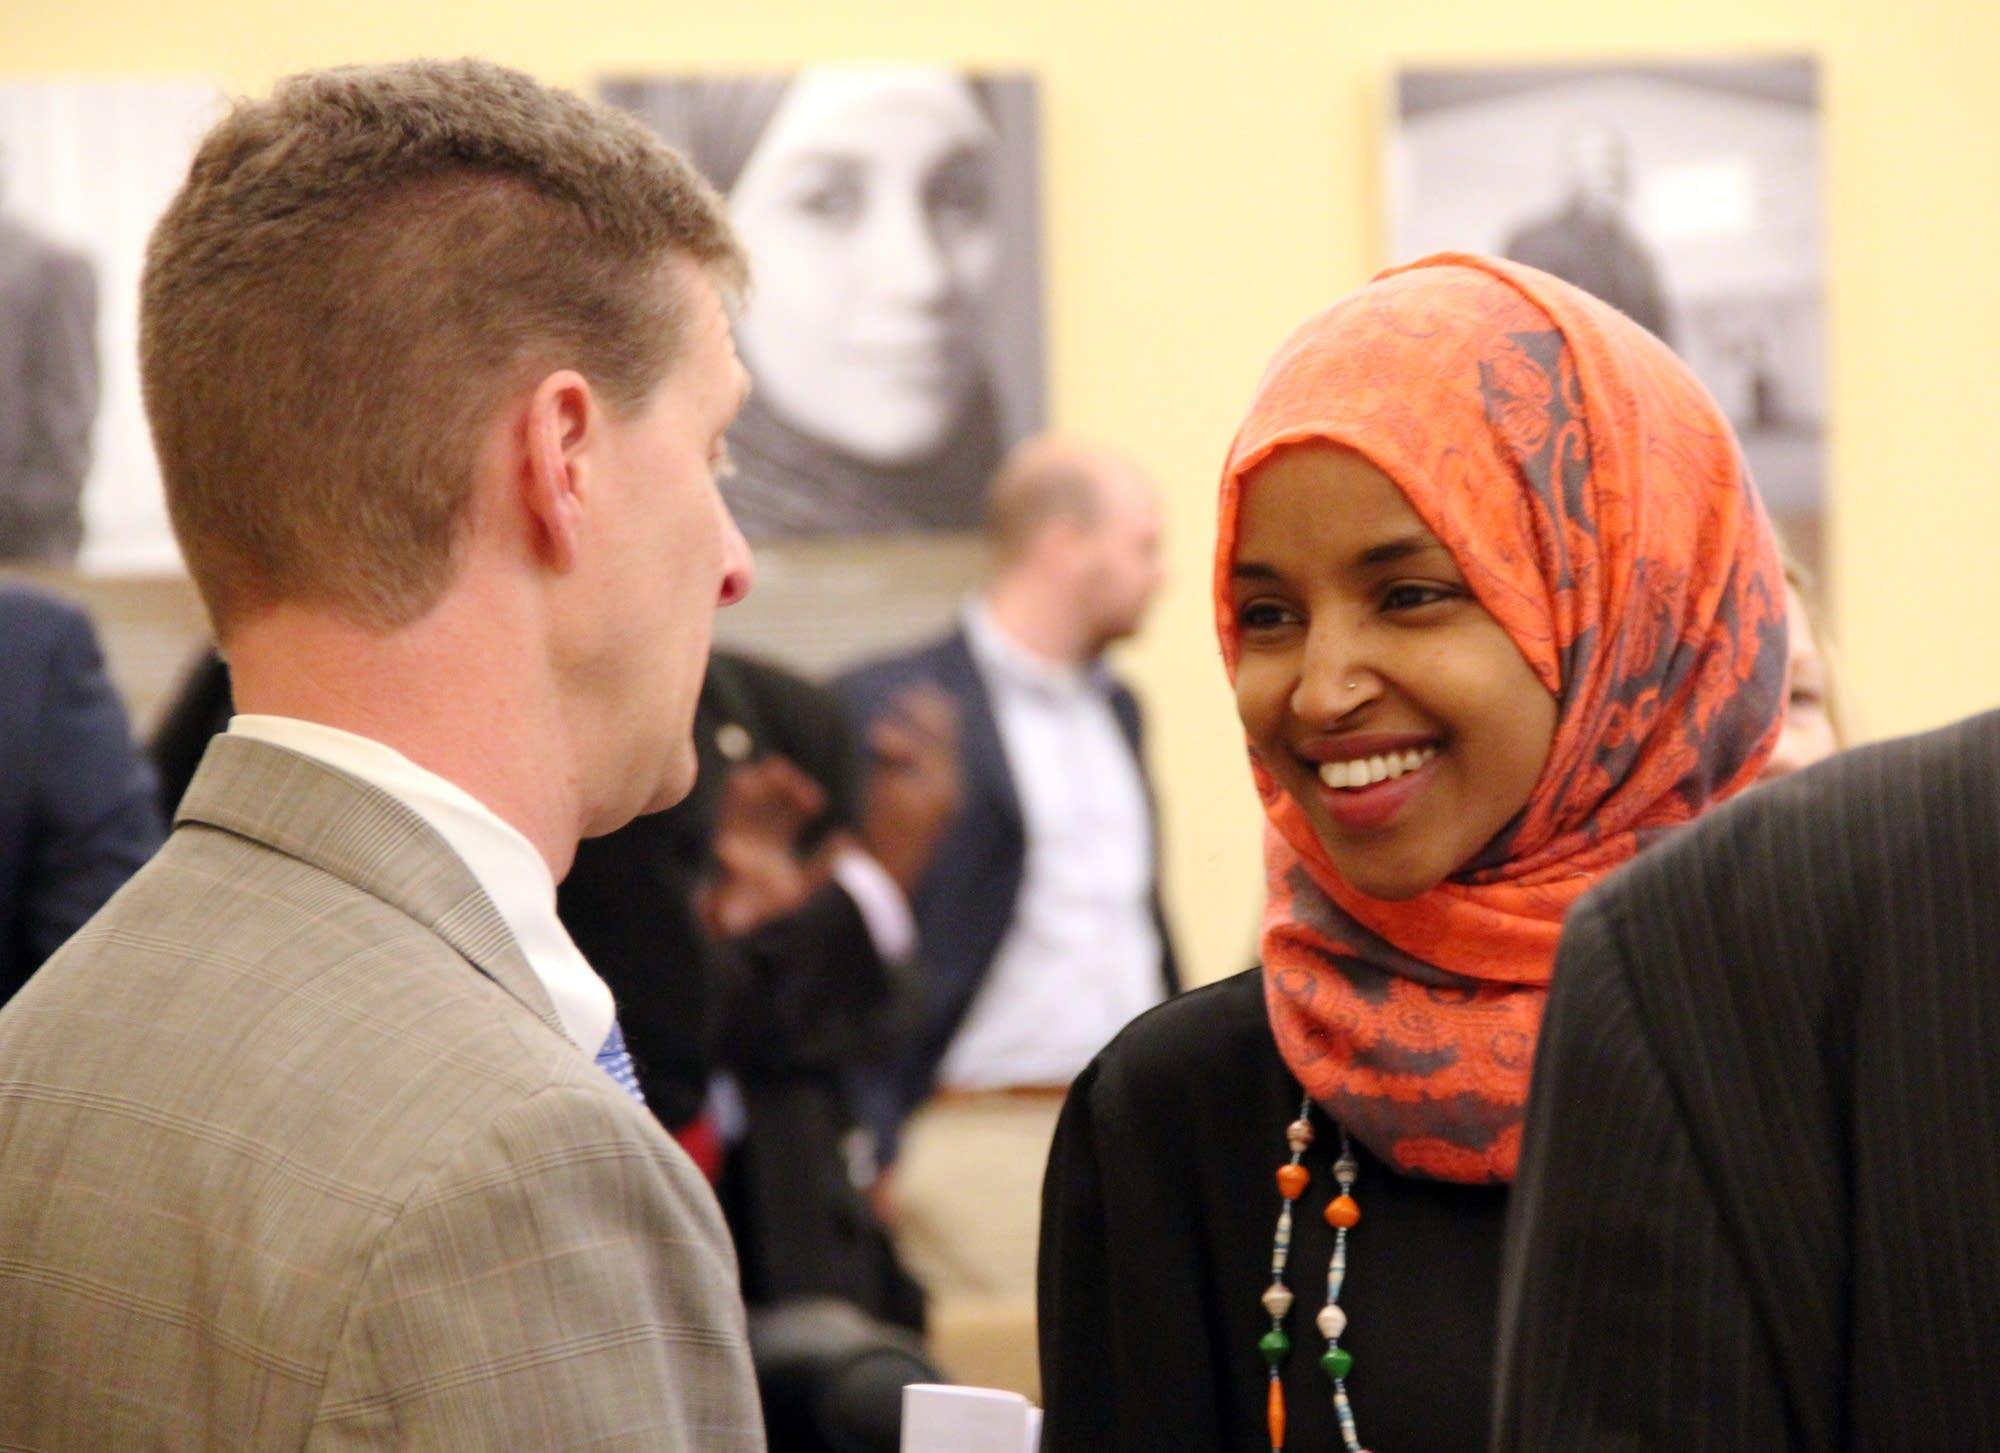 Lobbyist Shep Harris talks with Rep. Ilhan Omar.